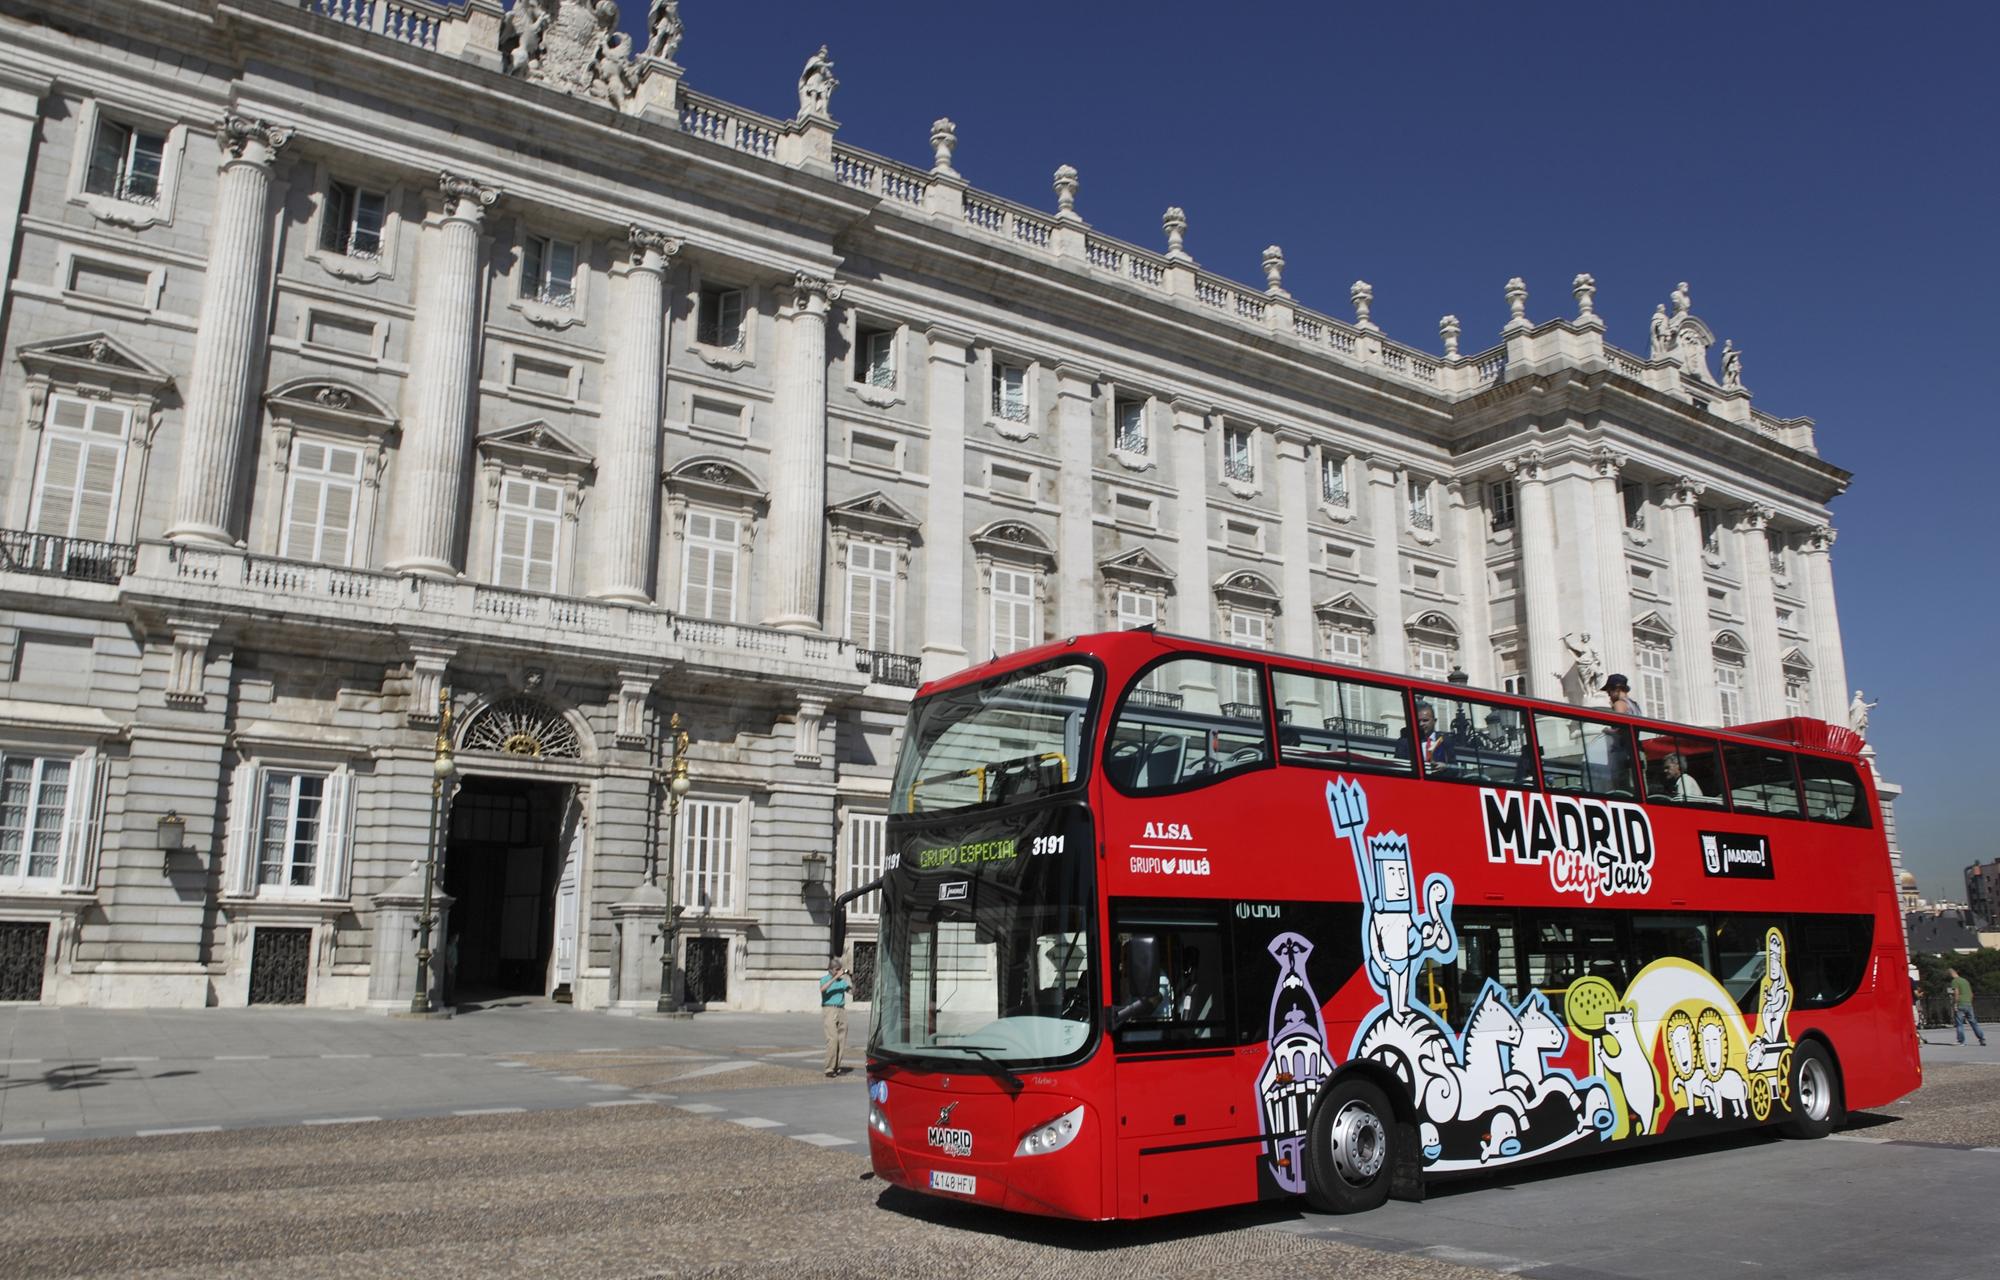 Autobus turistico a due piani